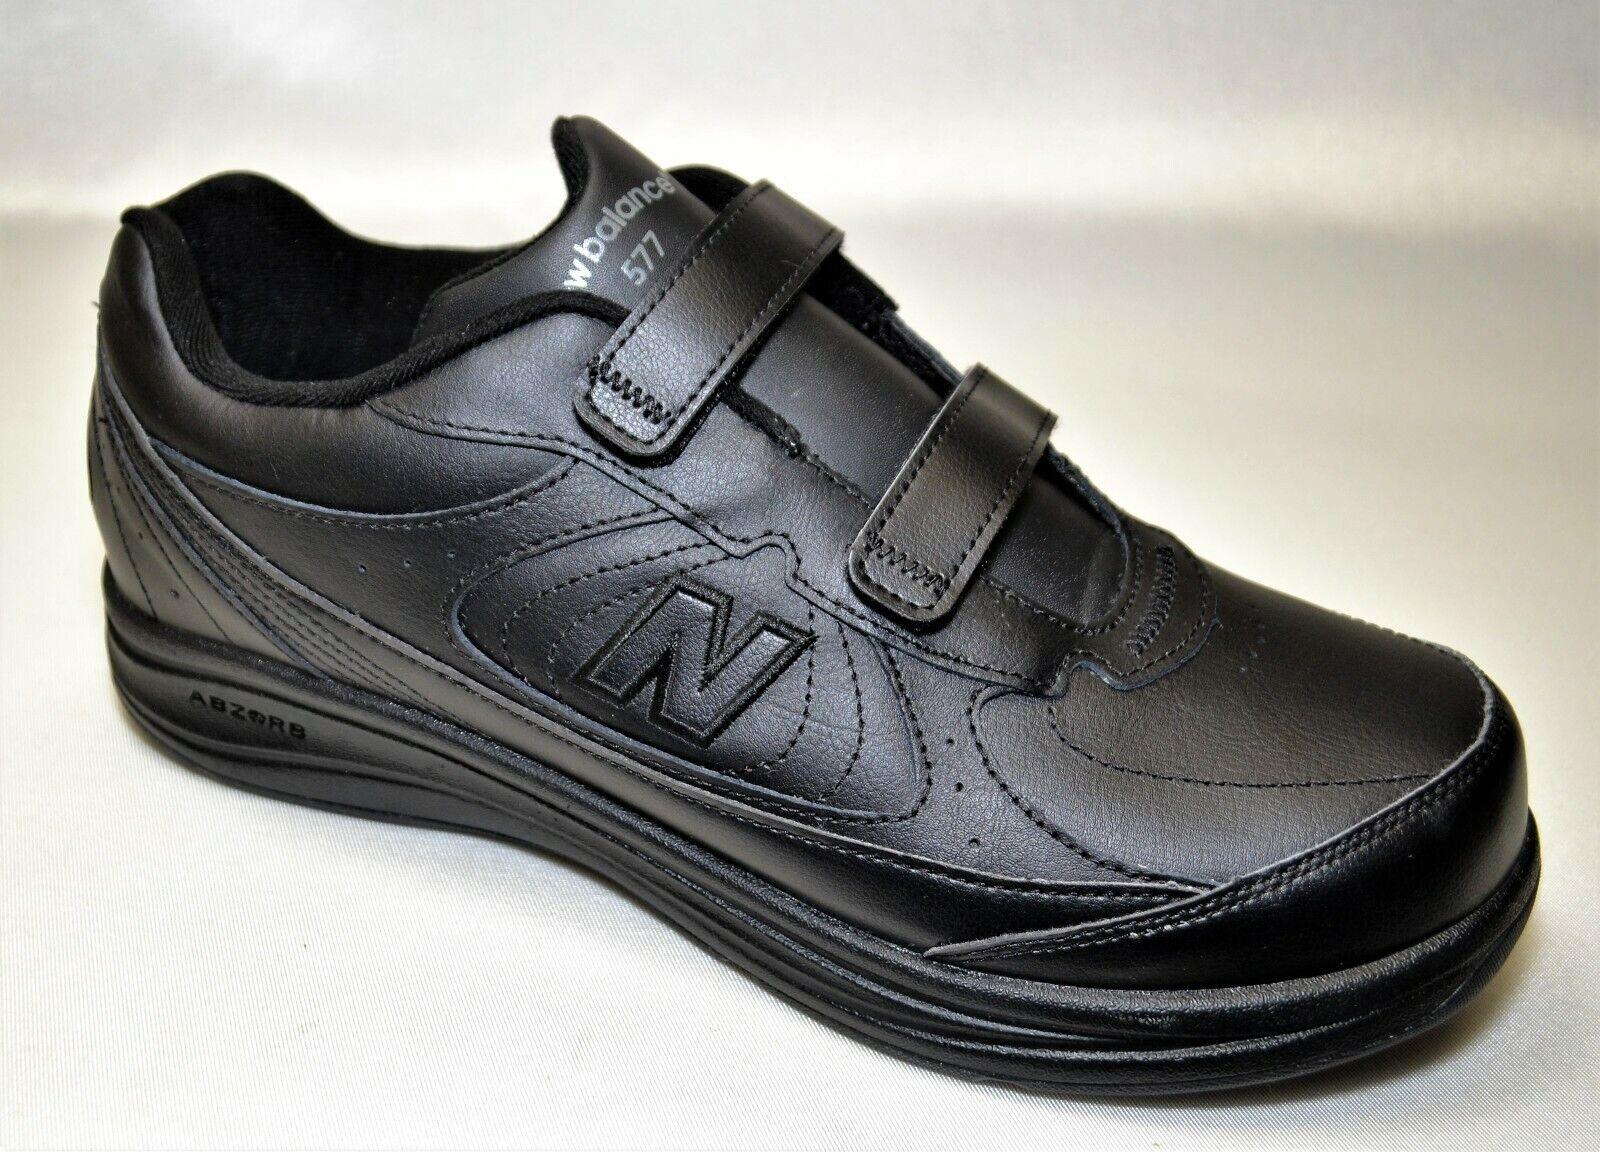 New Balance 577 Mens Size 11 (4E) Wide Black Leather Straps Walking Shoes EUC